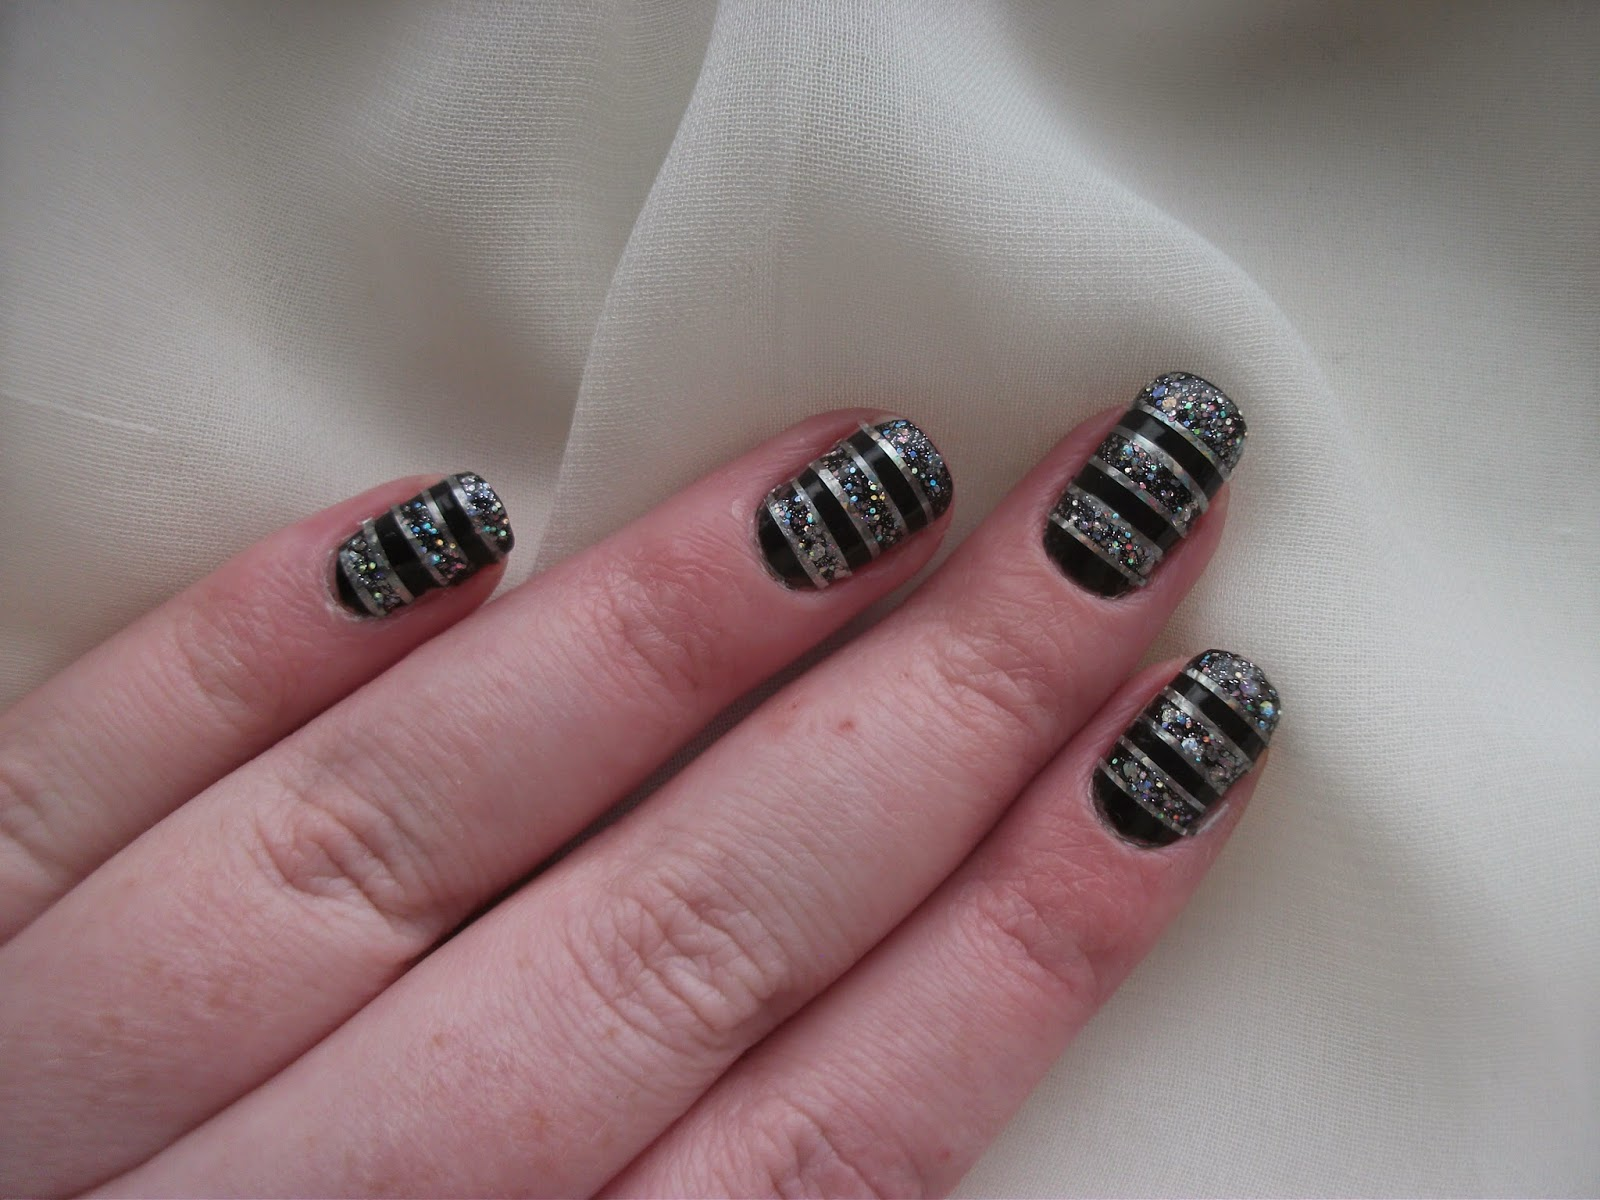 Rio Nail Artist Shimmer & Sparkle  notd